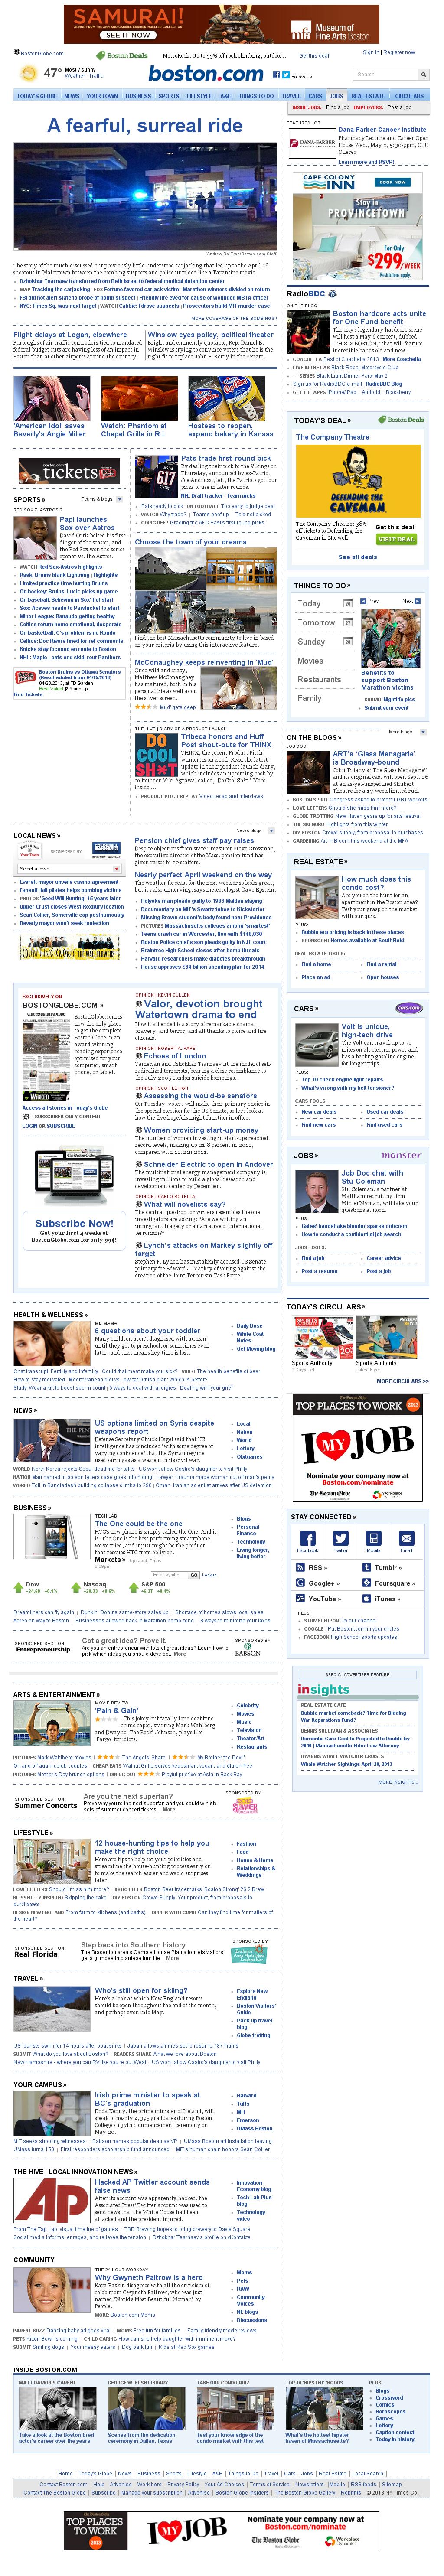 Boston.com at Friday April 26, 2013, 12:01 p.m. UTC